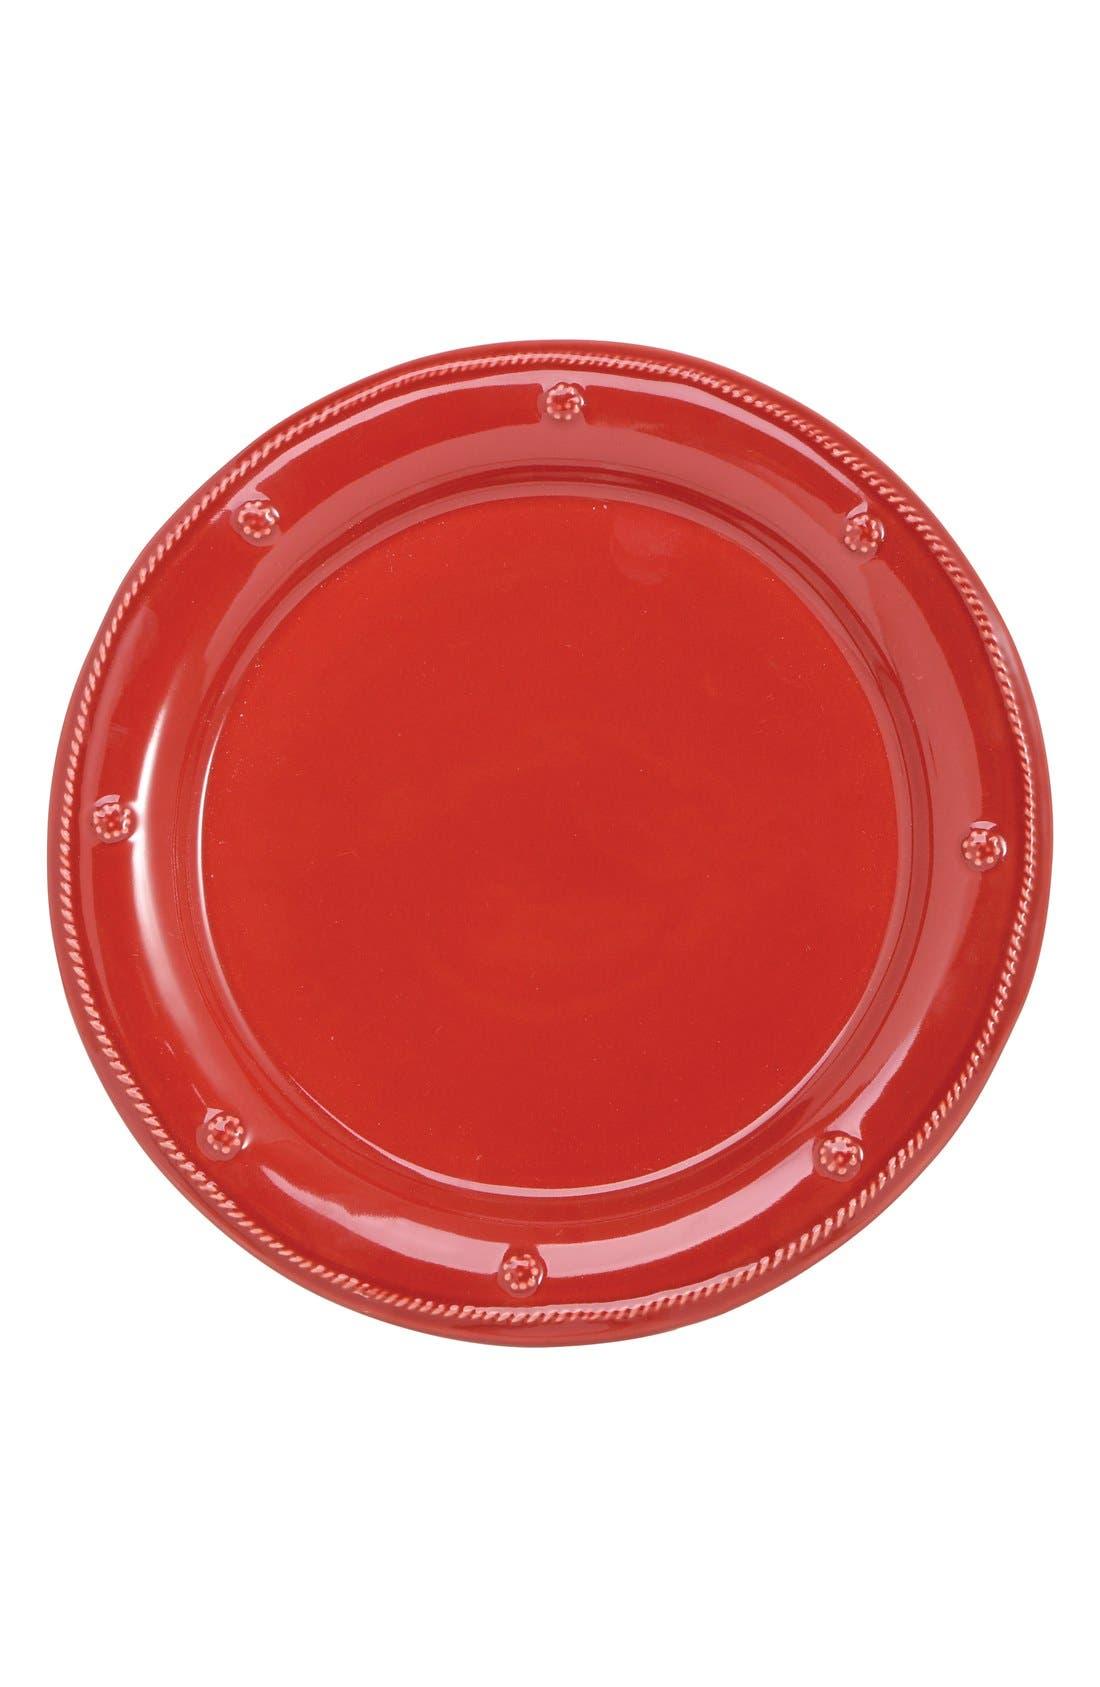 Alternate Image 1 Selected - Juliska'Berry and Thread' Dinner Plate